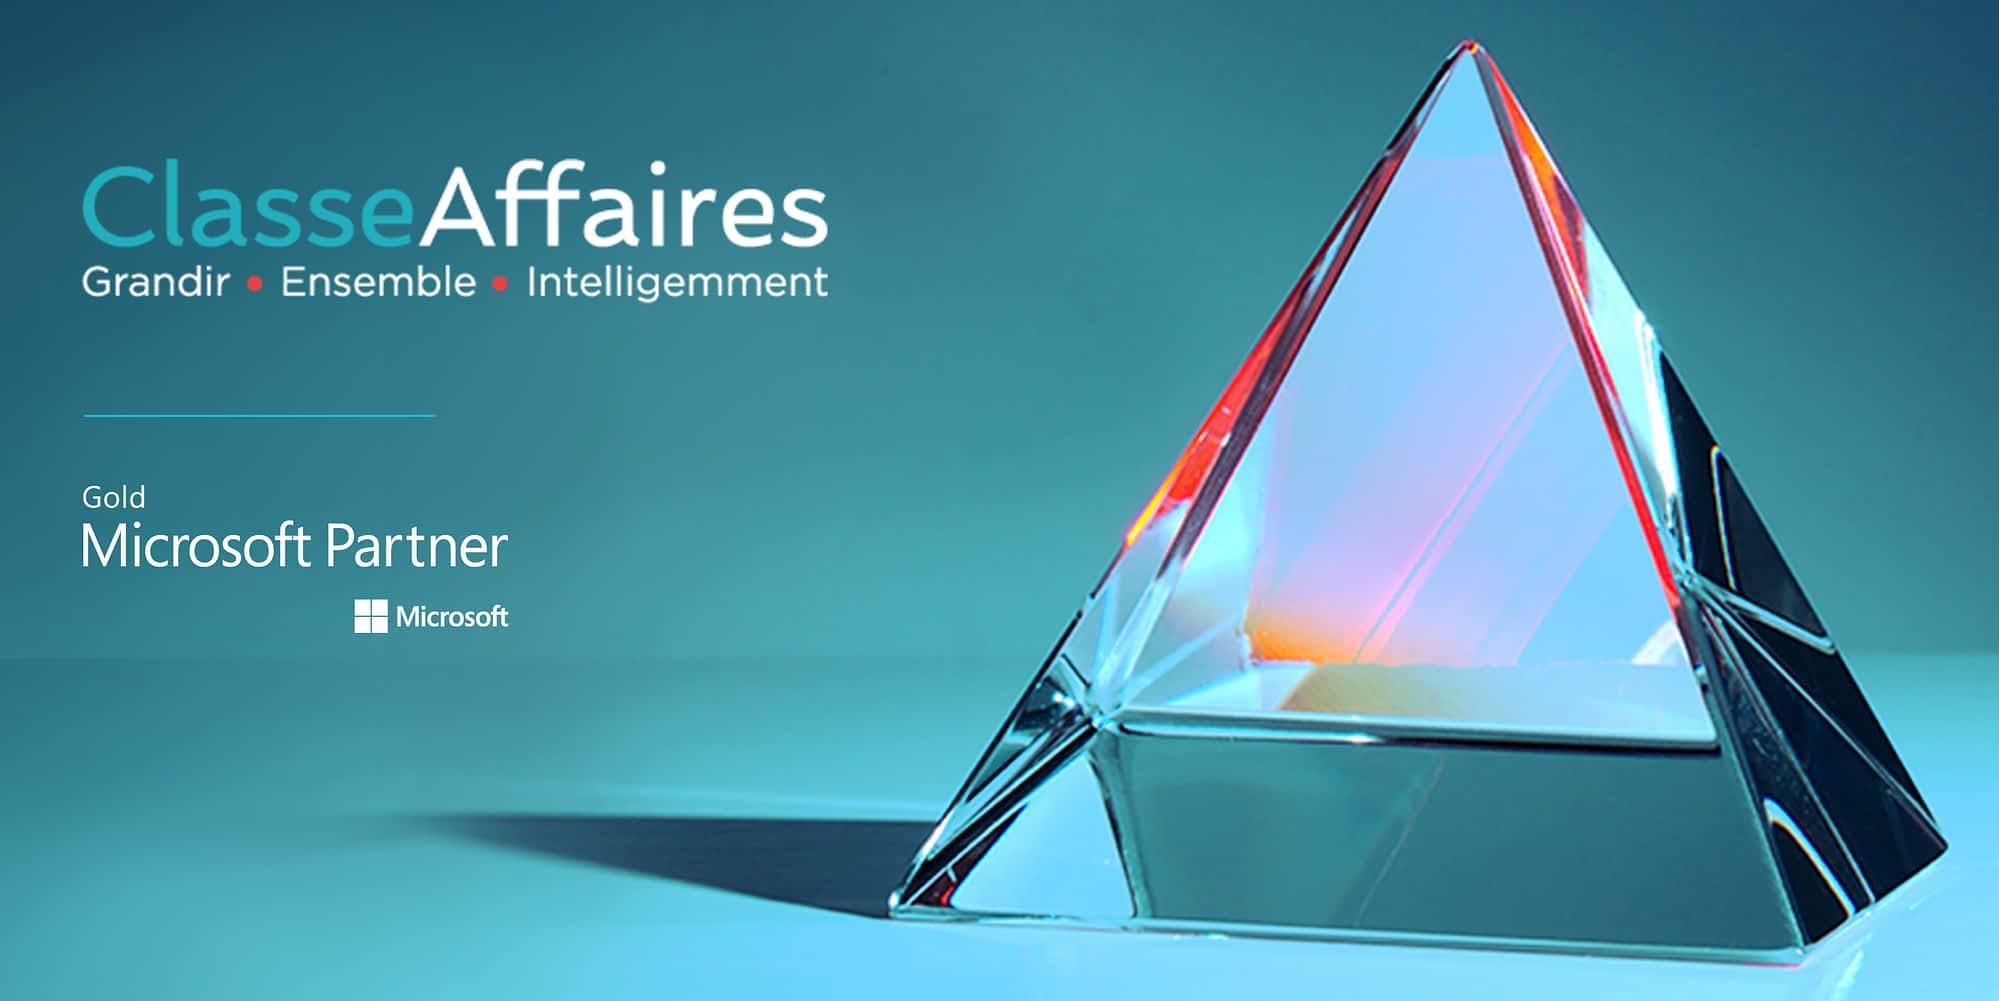 Classe Affaires - Microsoft Partner Gold